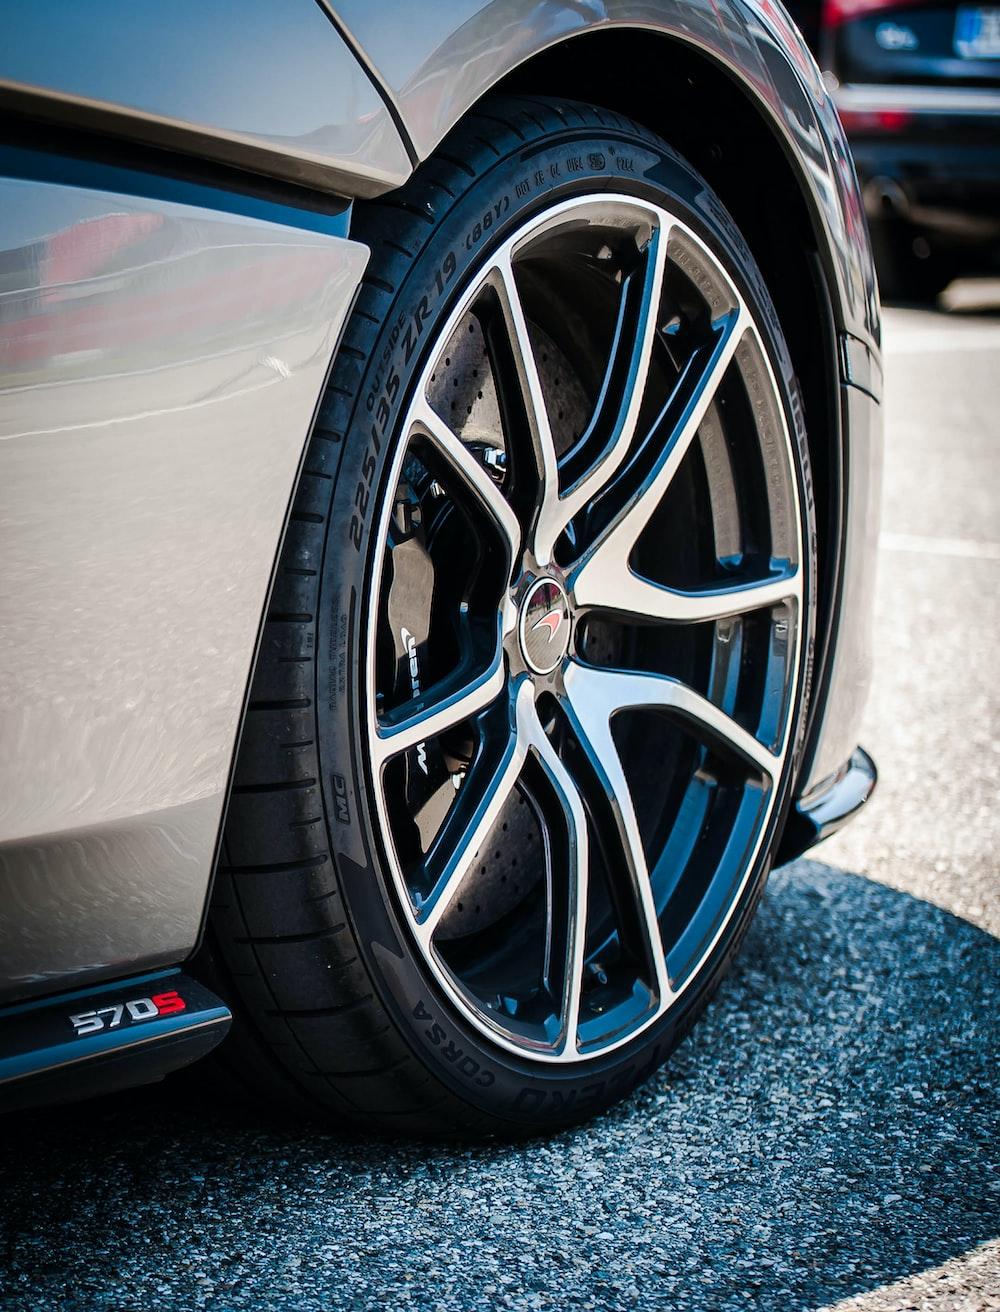 chrome multi-spoke wheel and black tire